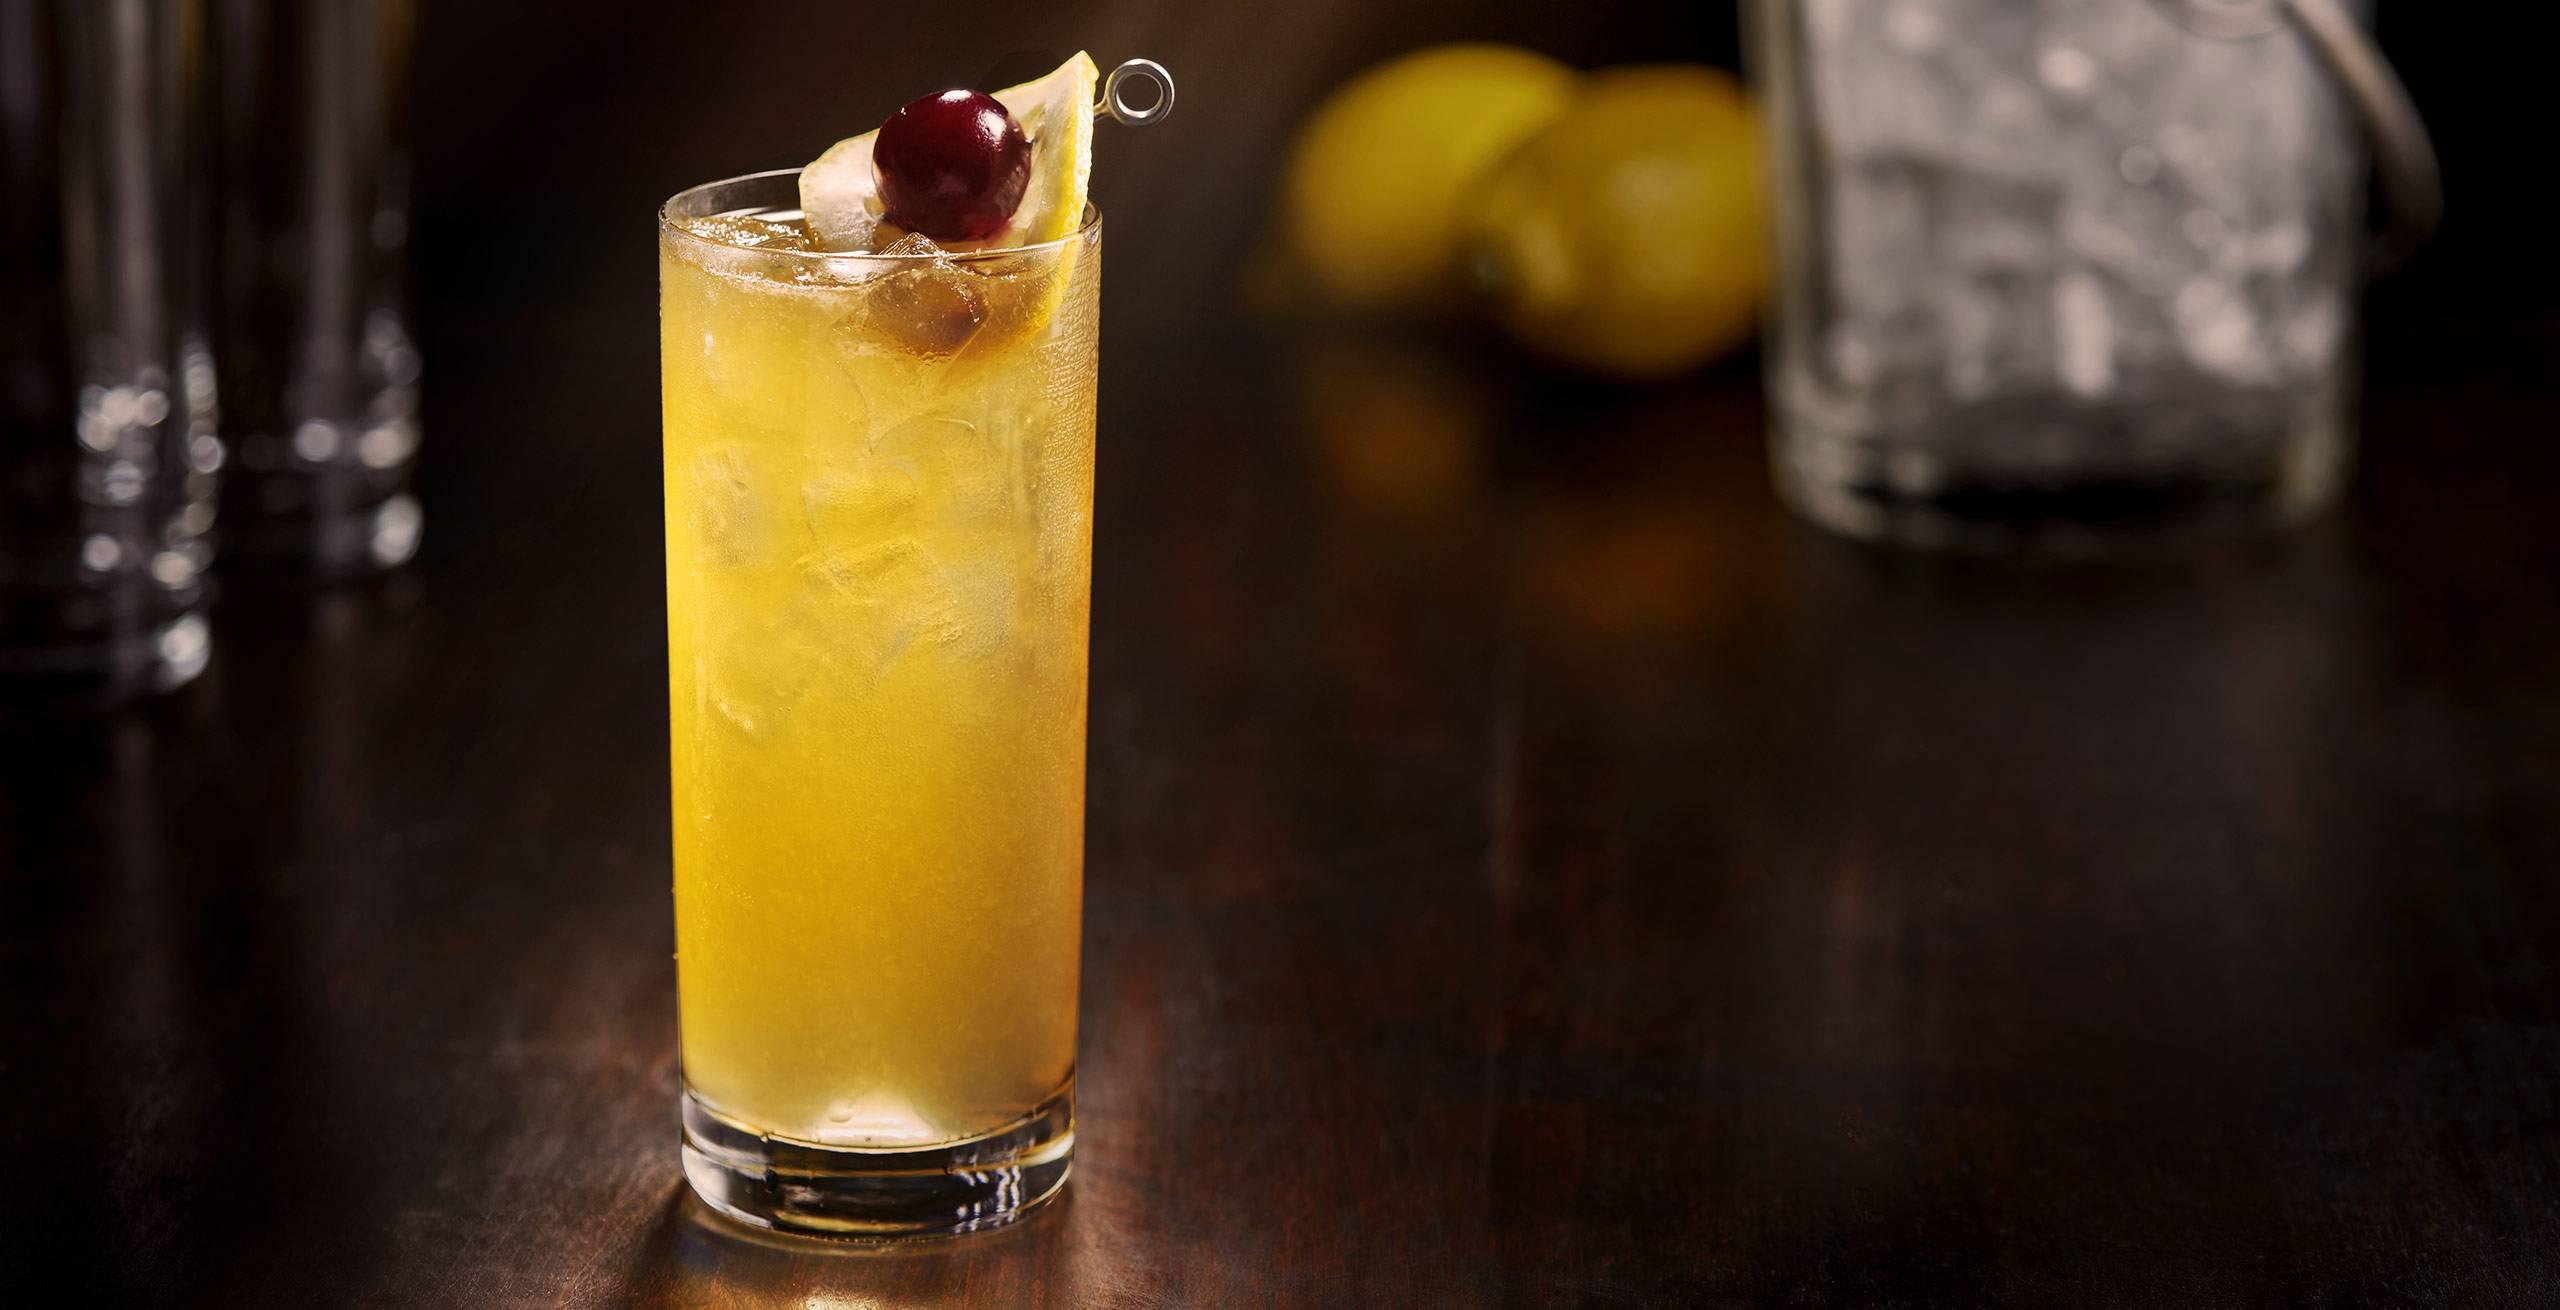 Джон коллинз коктейль — история алкоголя